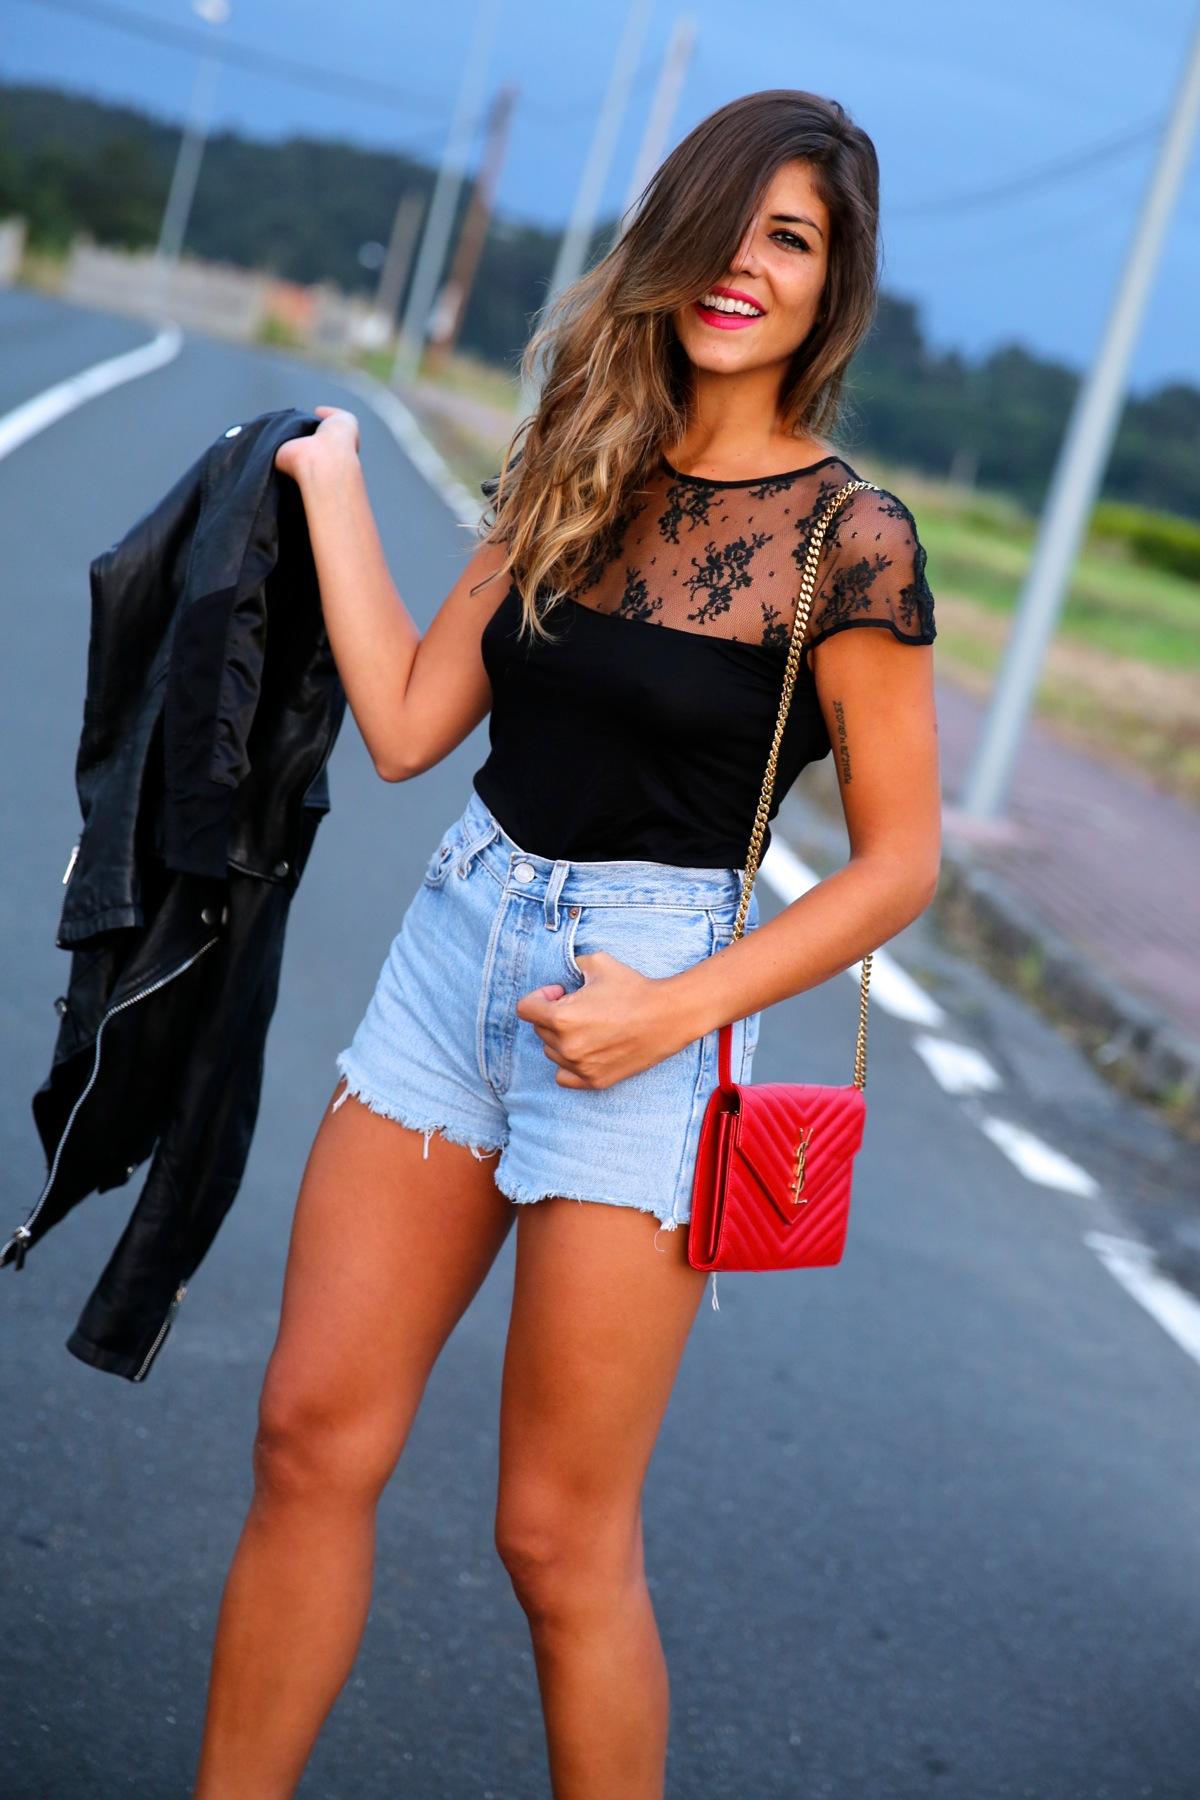 trendy_taste-look-outfit-street_style-ootd-blog-blogger-fashion_spain-moda_españa-denim_shorts-shorts_vaqueros-chaqueta_cuero-leather_jacket-ysl-saint_laurent-6